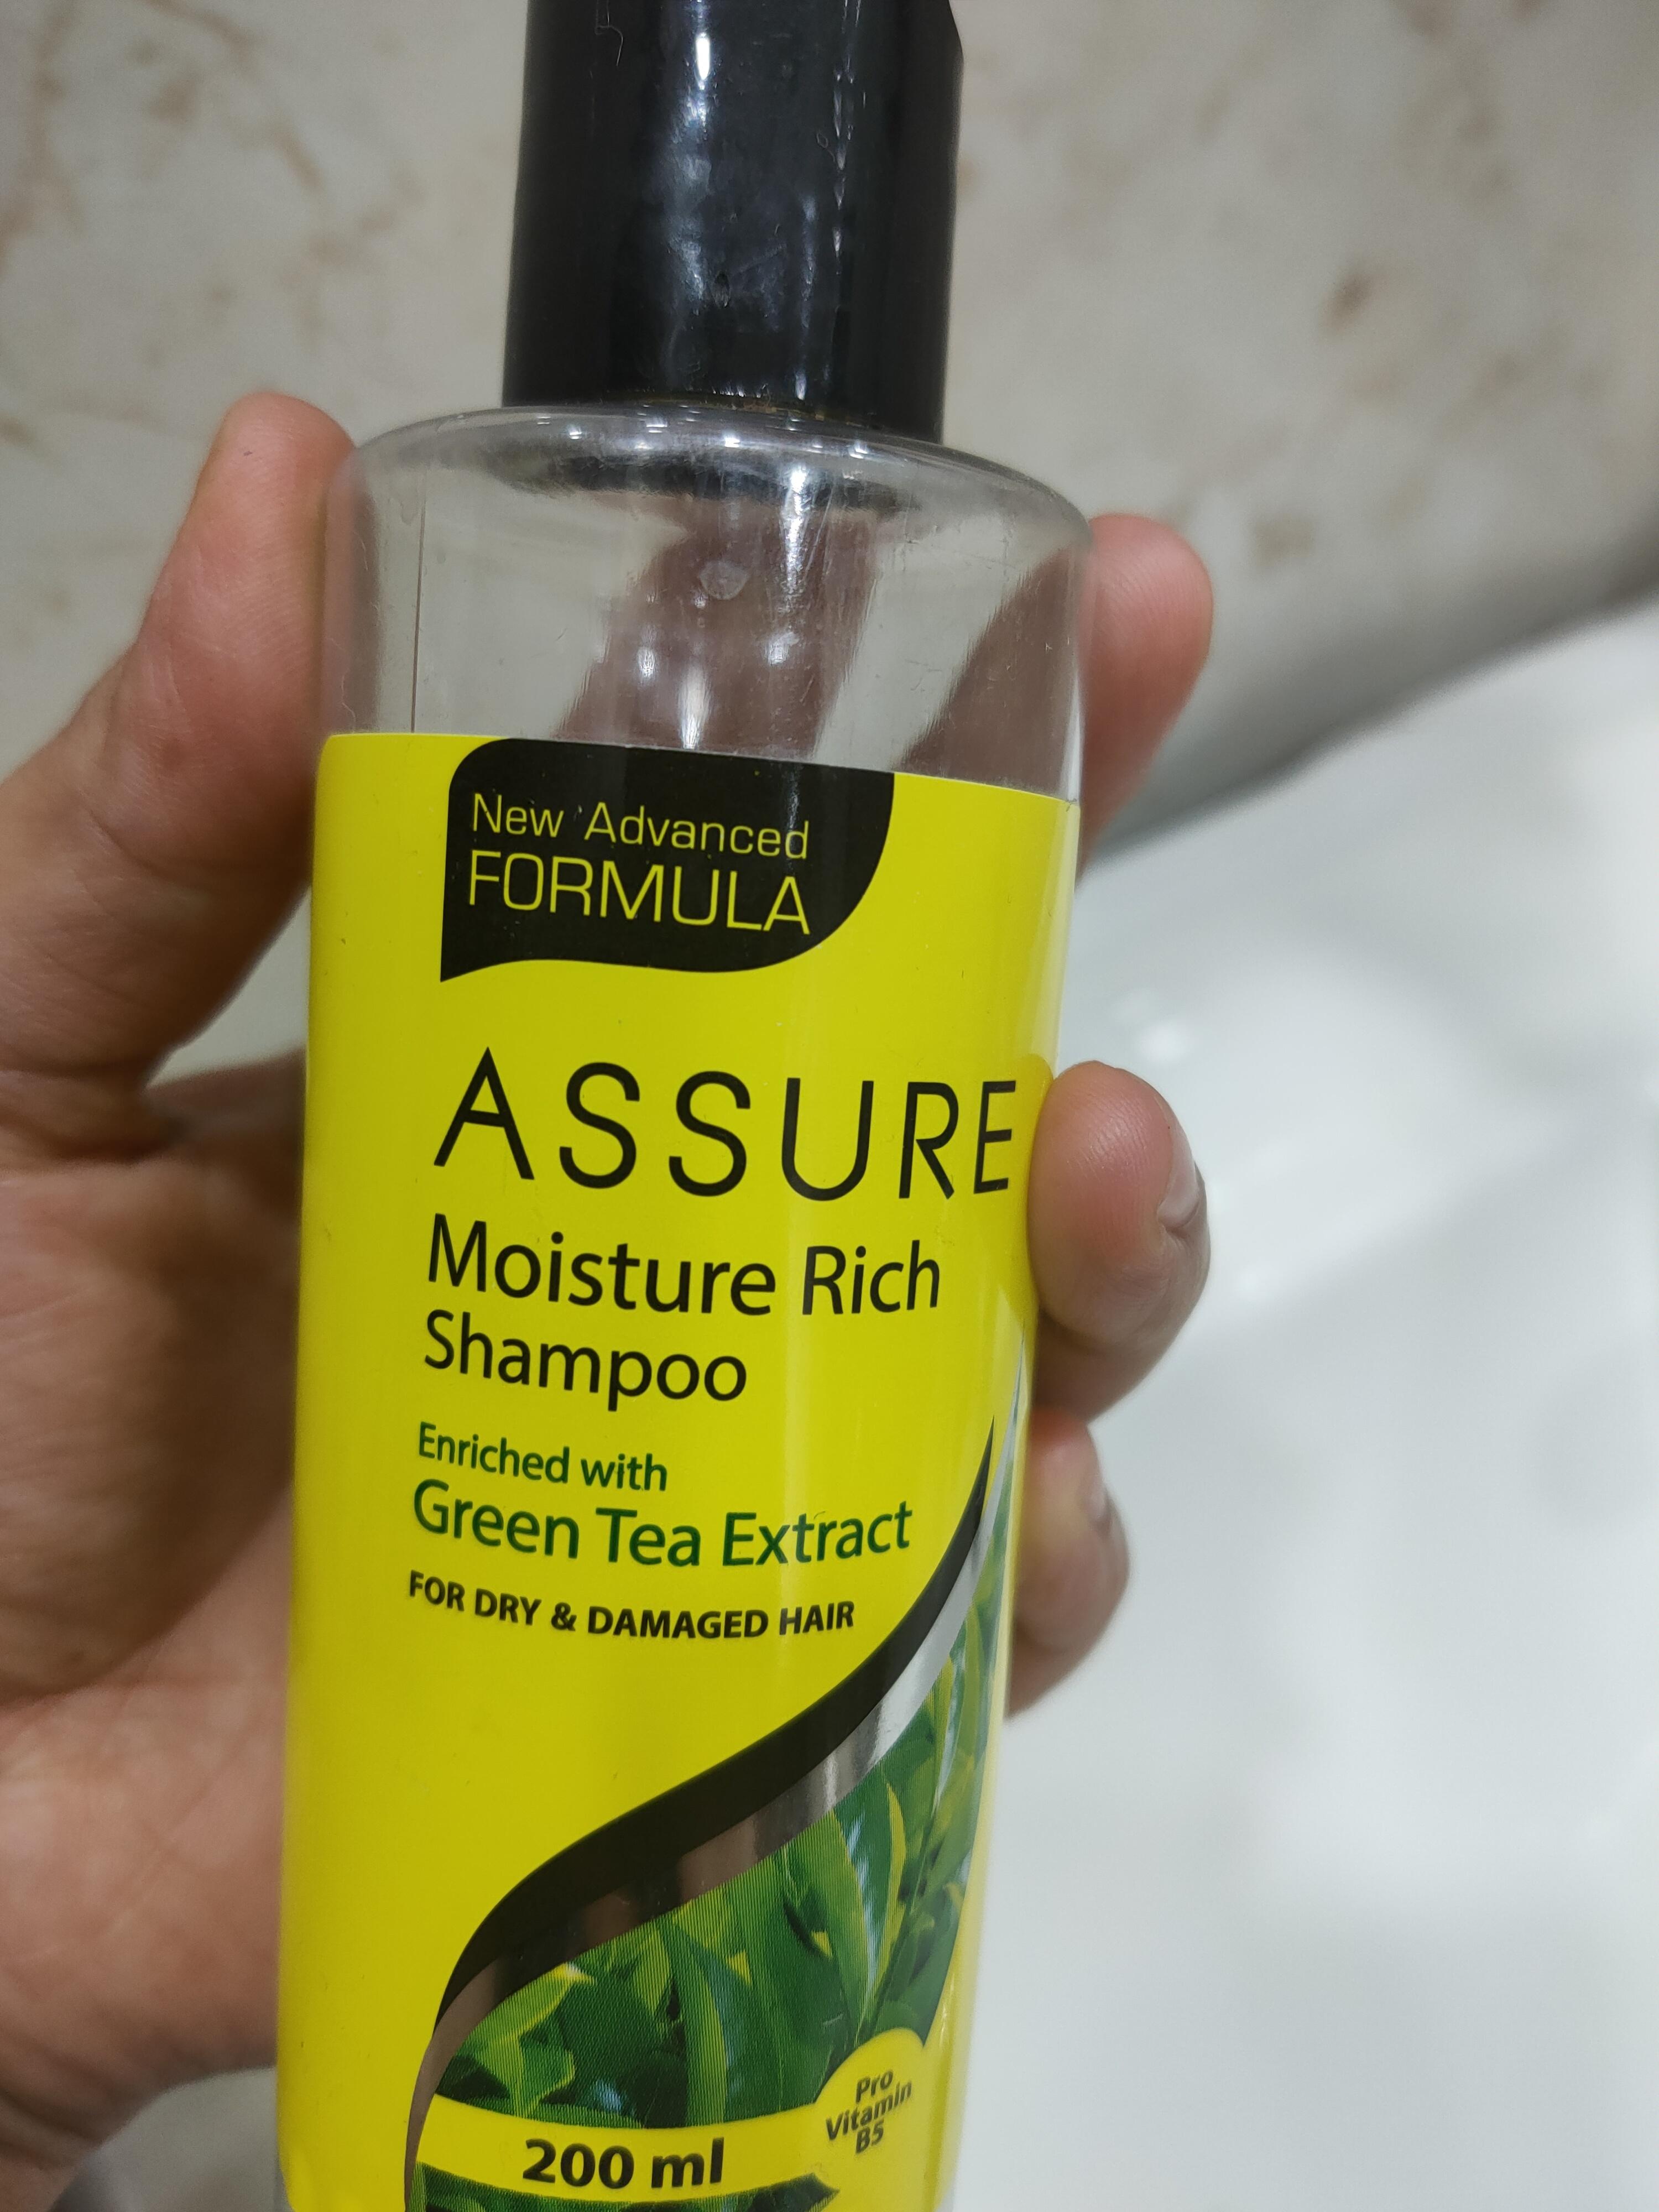 Assure Moisture Rich Shampoo -Good for dry hair-By suhanigaba